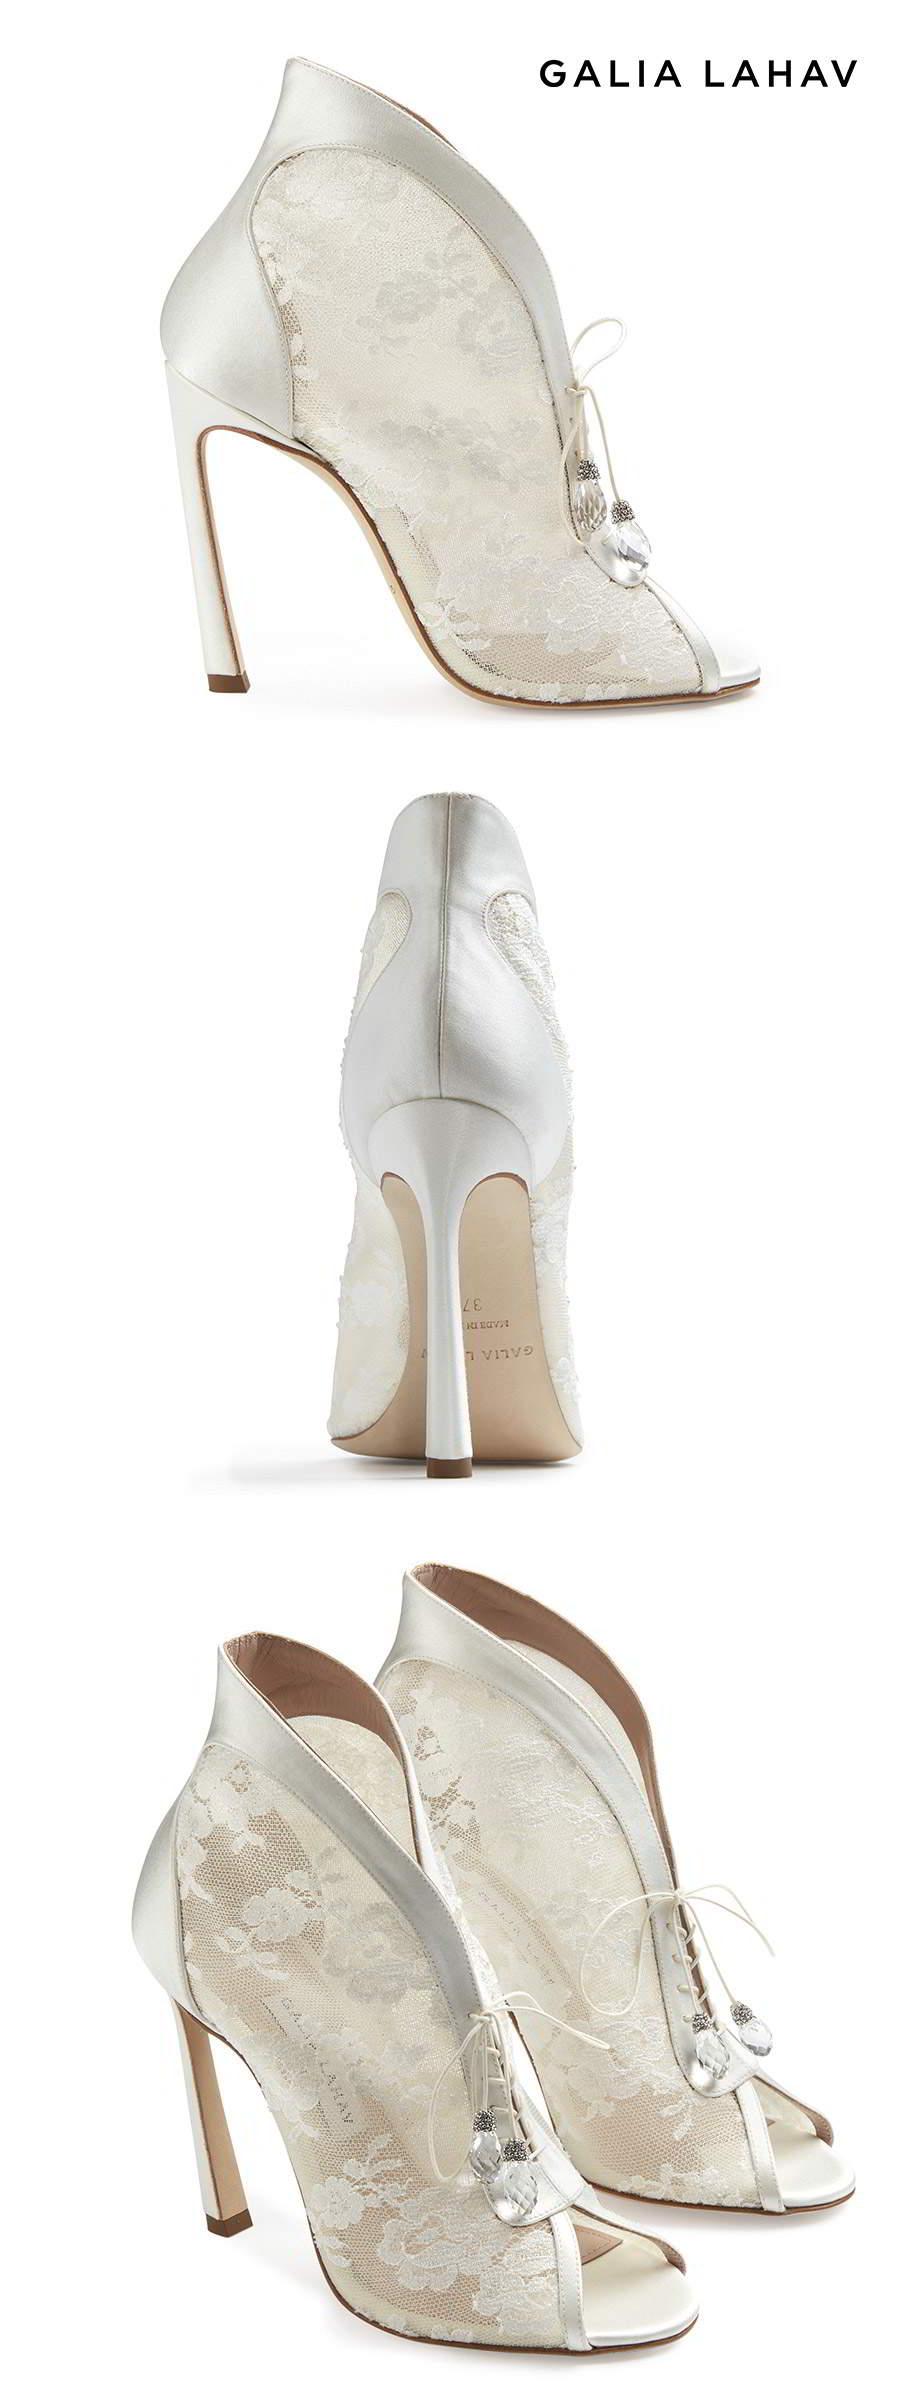 galia lahav shoes fall 2021 bridal lace open toe strap ghillie pump high heel wedding shoes (lucinda lace) mv